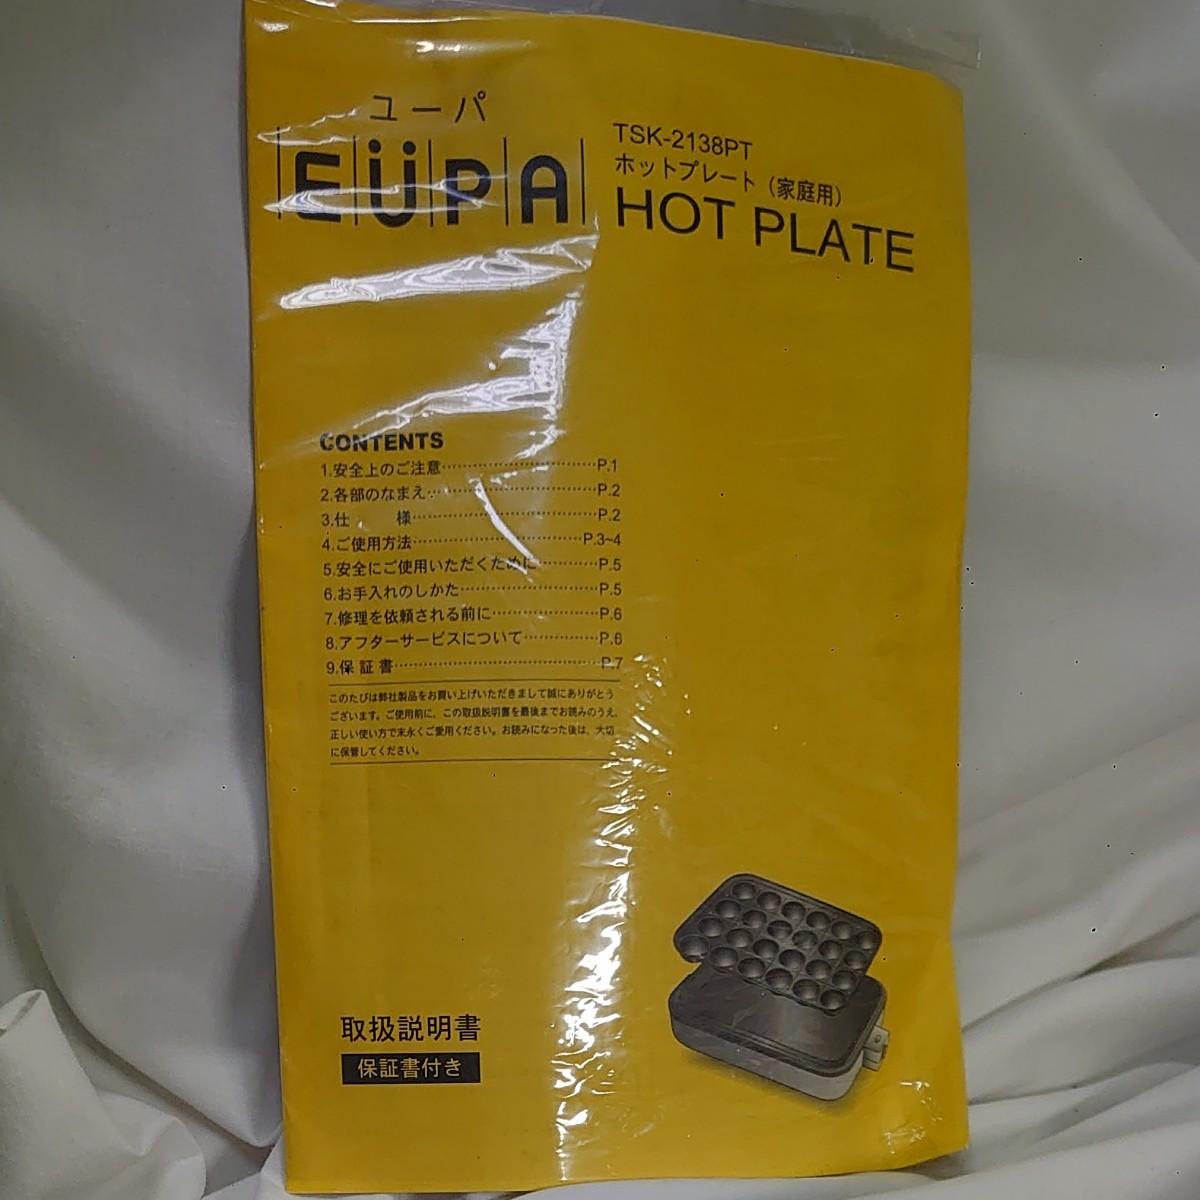 EUPA 角型ホットプレート たこ焼プレート ホットプレート 焼肉 美品 たこ焼き器 2way ユーパ